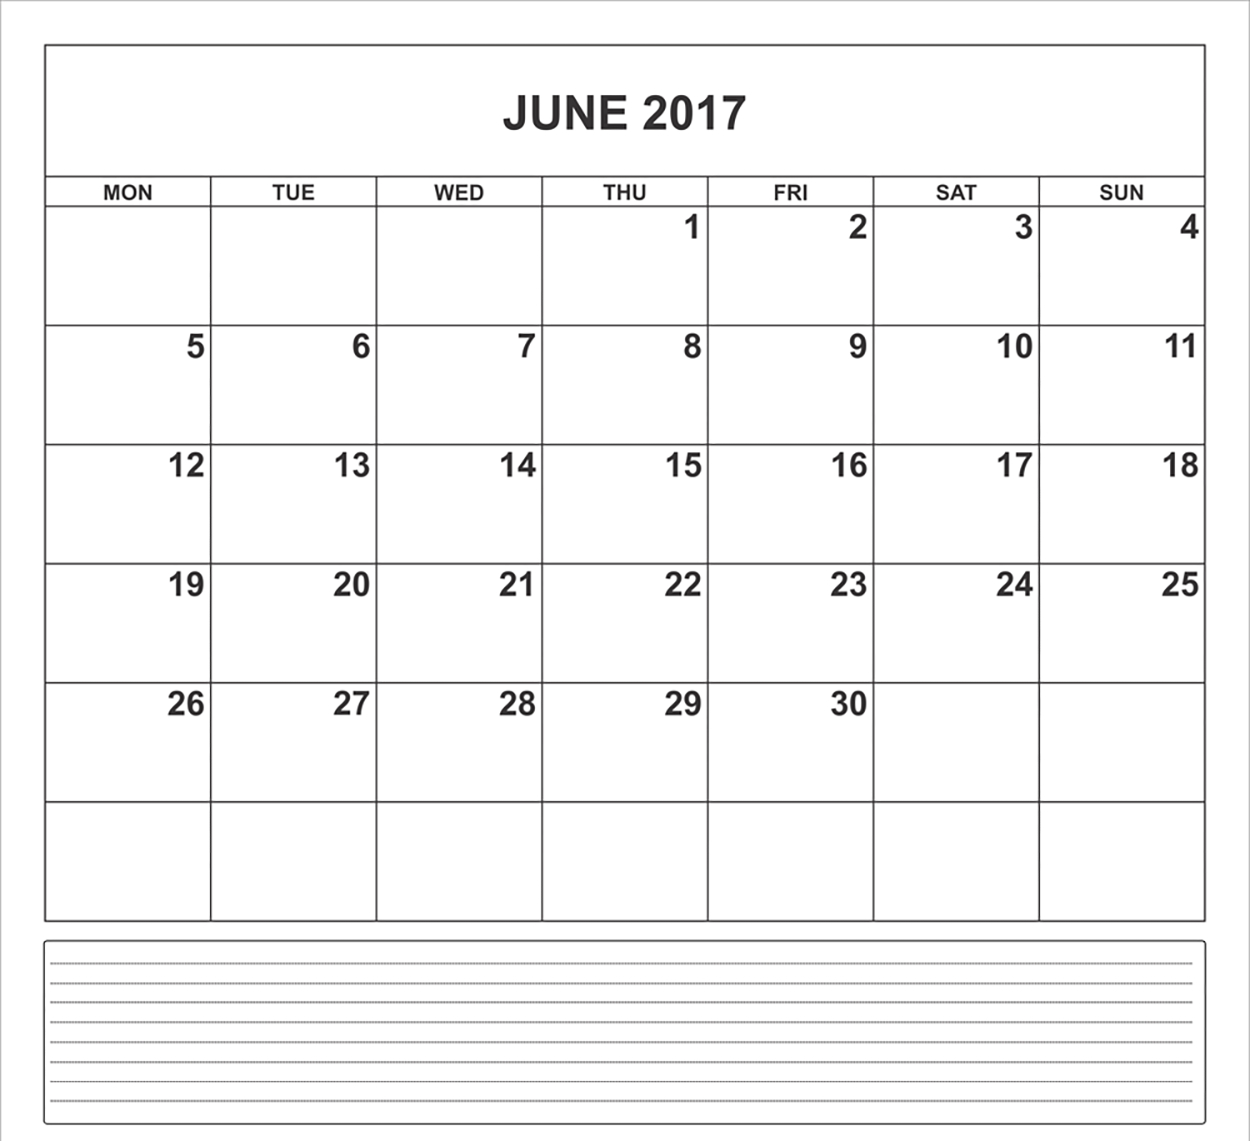 June 2017 Excel Calendar, 2017 June Excel Calendar Templates (.xls